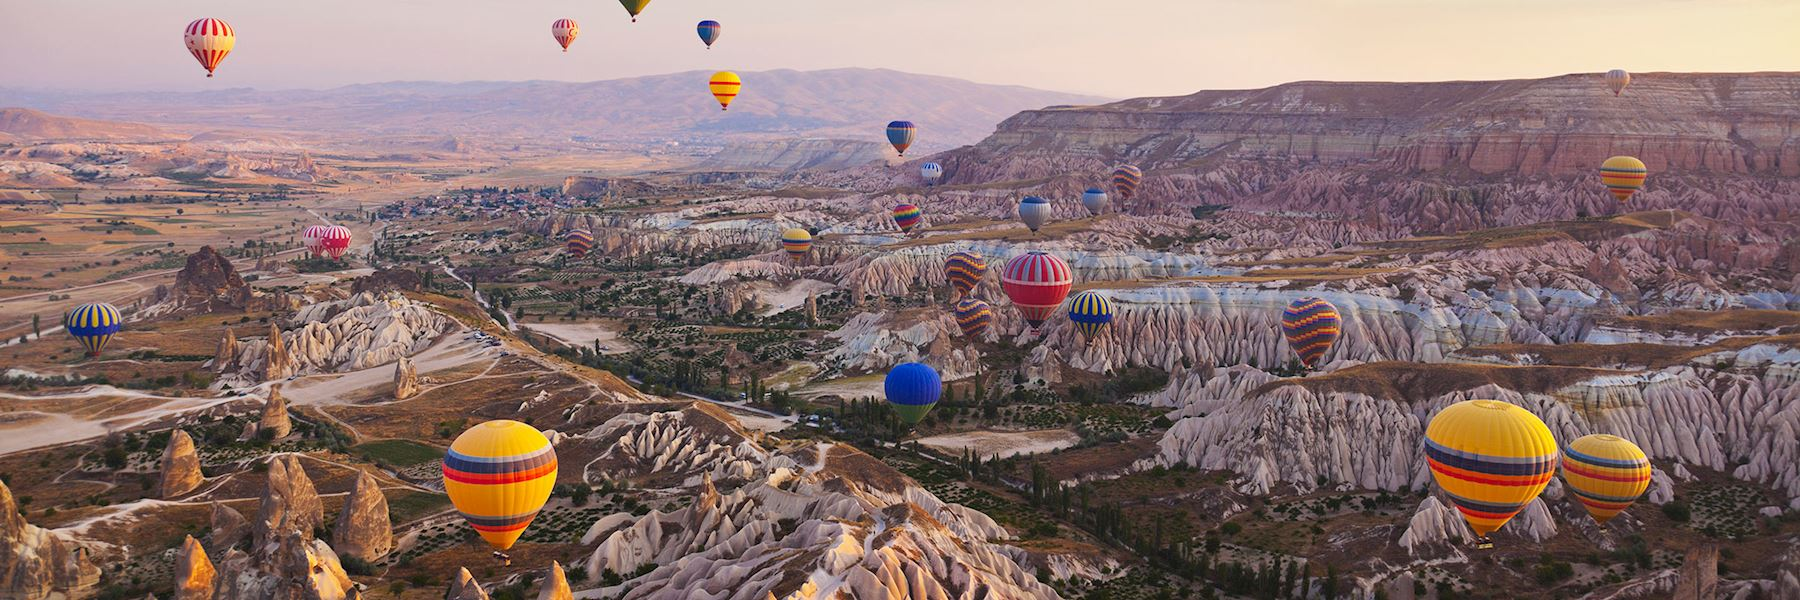 Turkey trip ideas